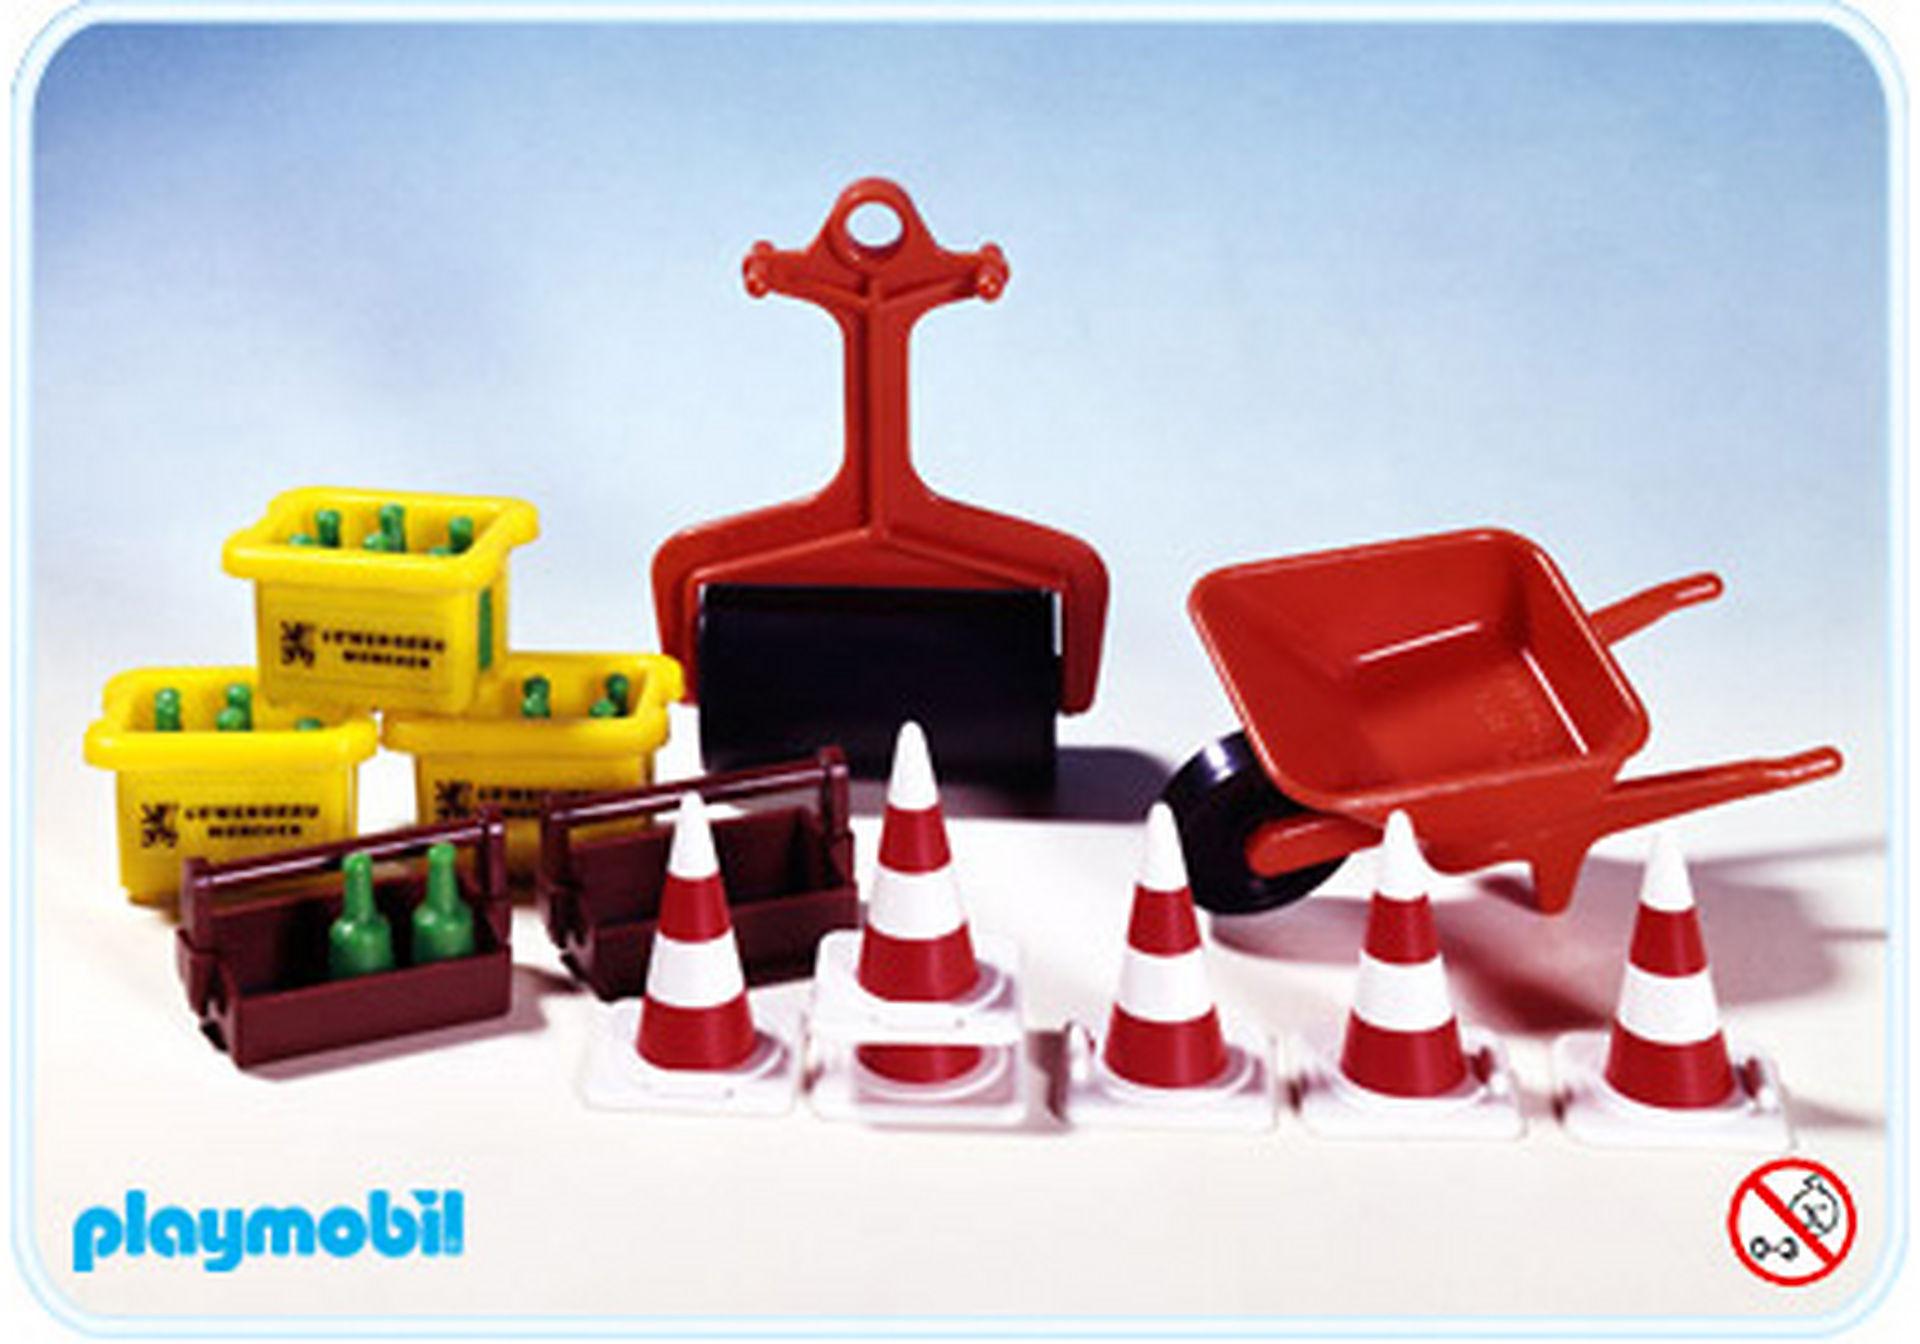 http://media.playmobil.com/i/playmobil/3202-B_product_detail/Travaux publics - accessoires